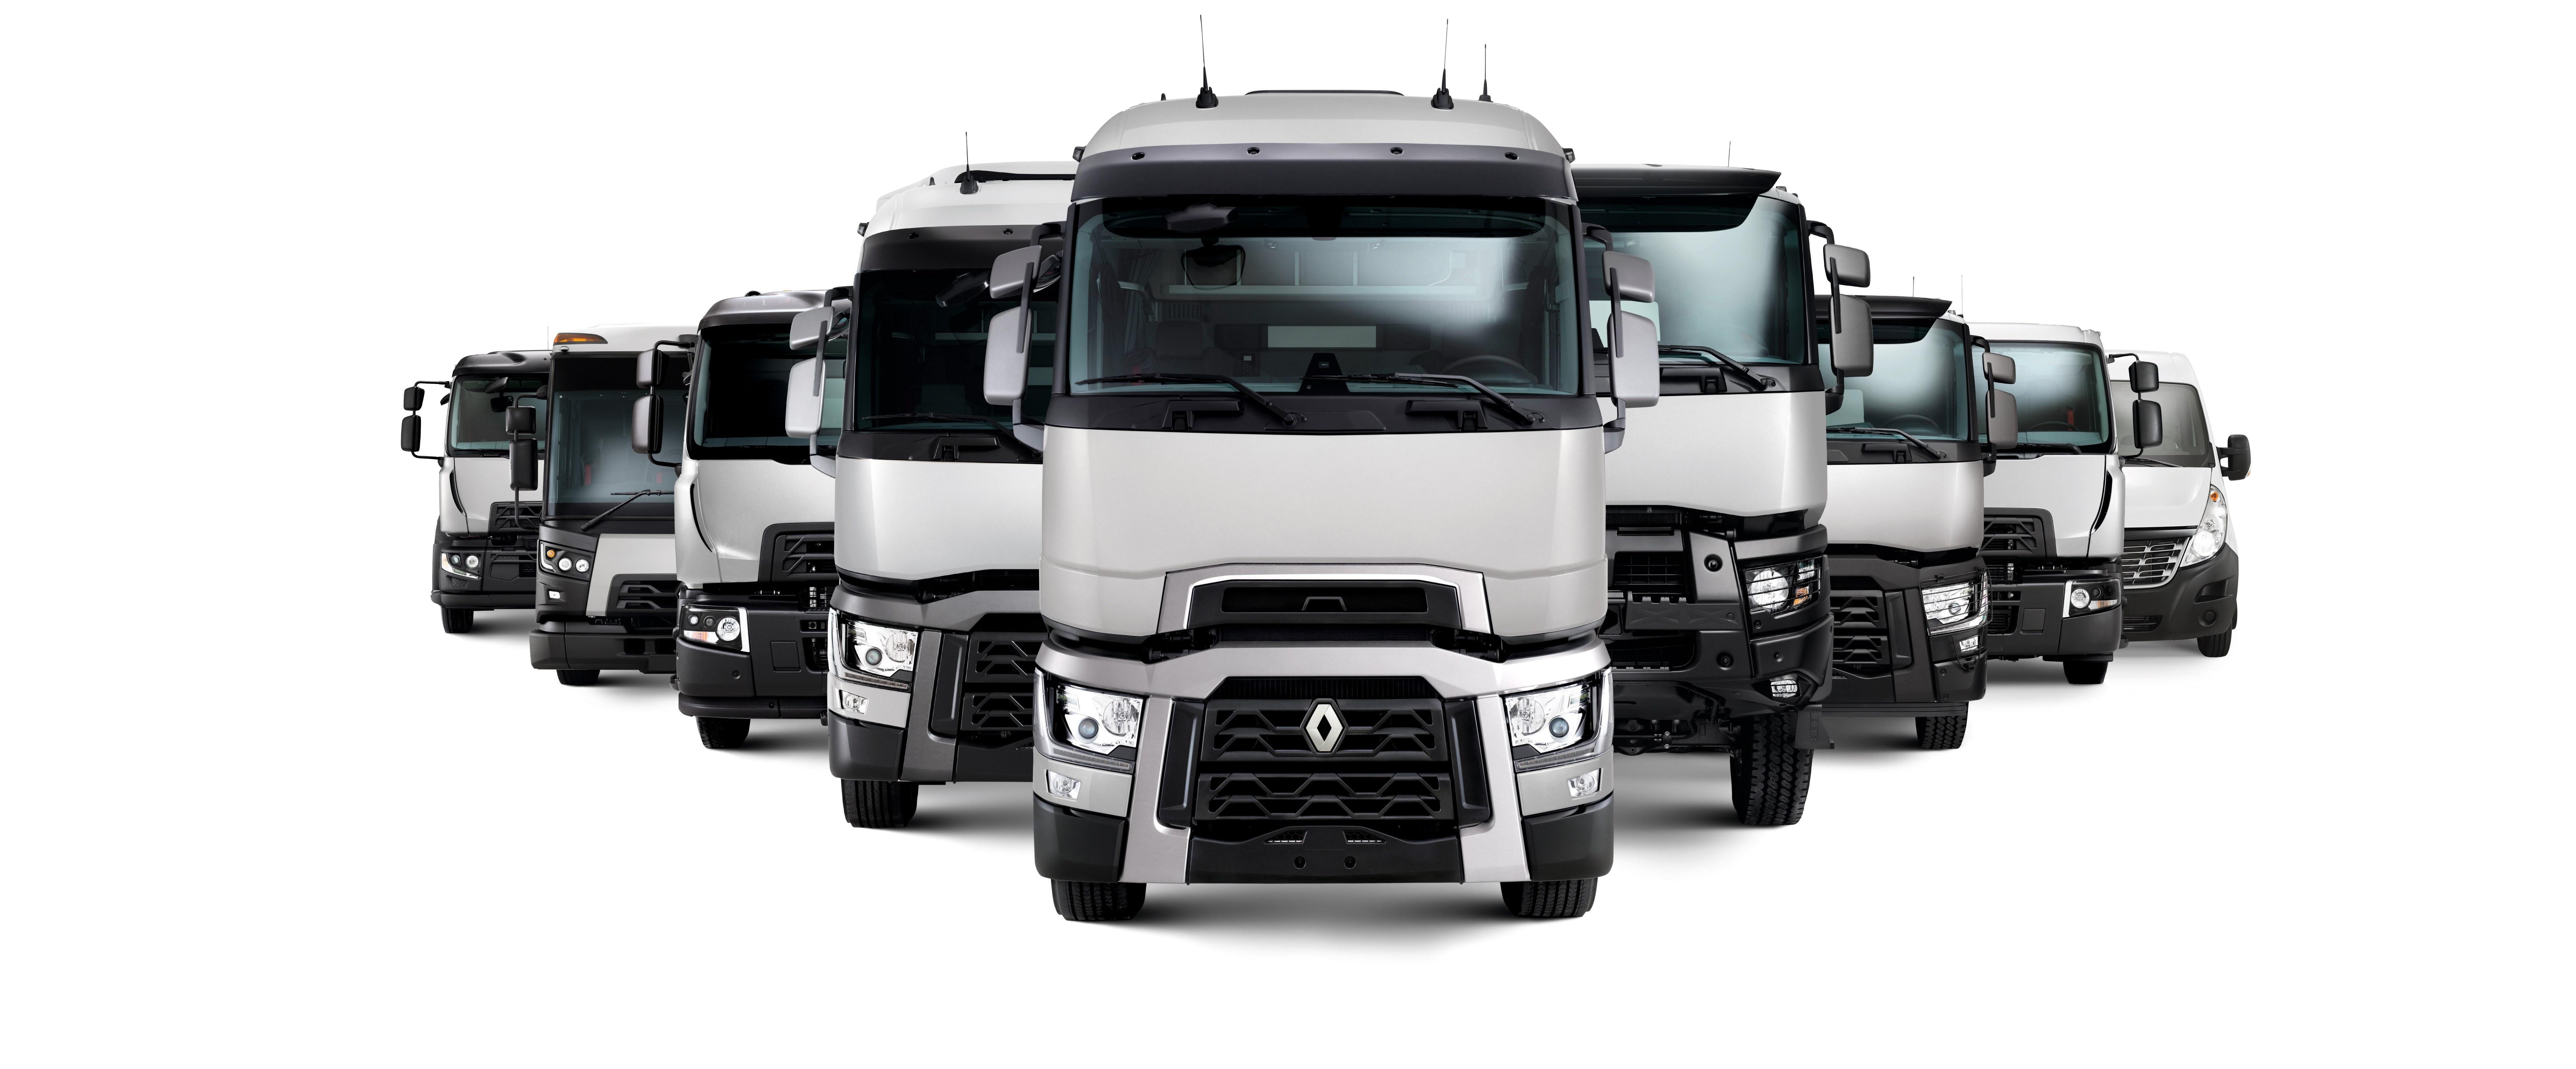 renault trucks 2017 tir transnews tir transnews. Black Bedroom Furniture Sets. Home Design Ideas